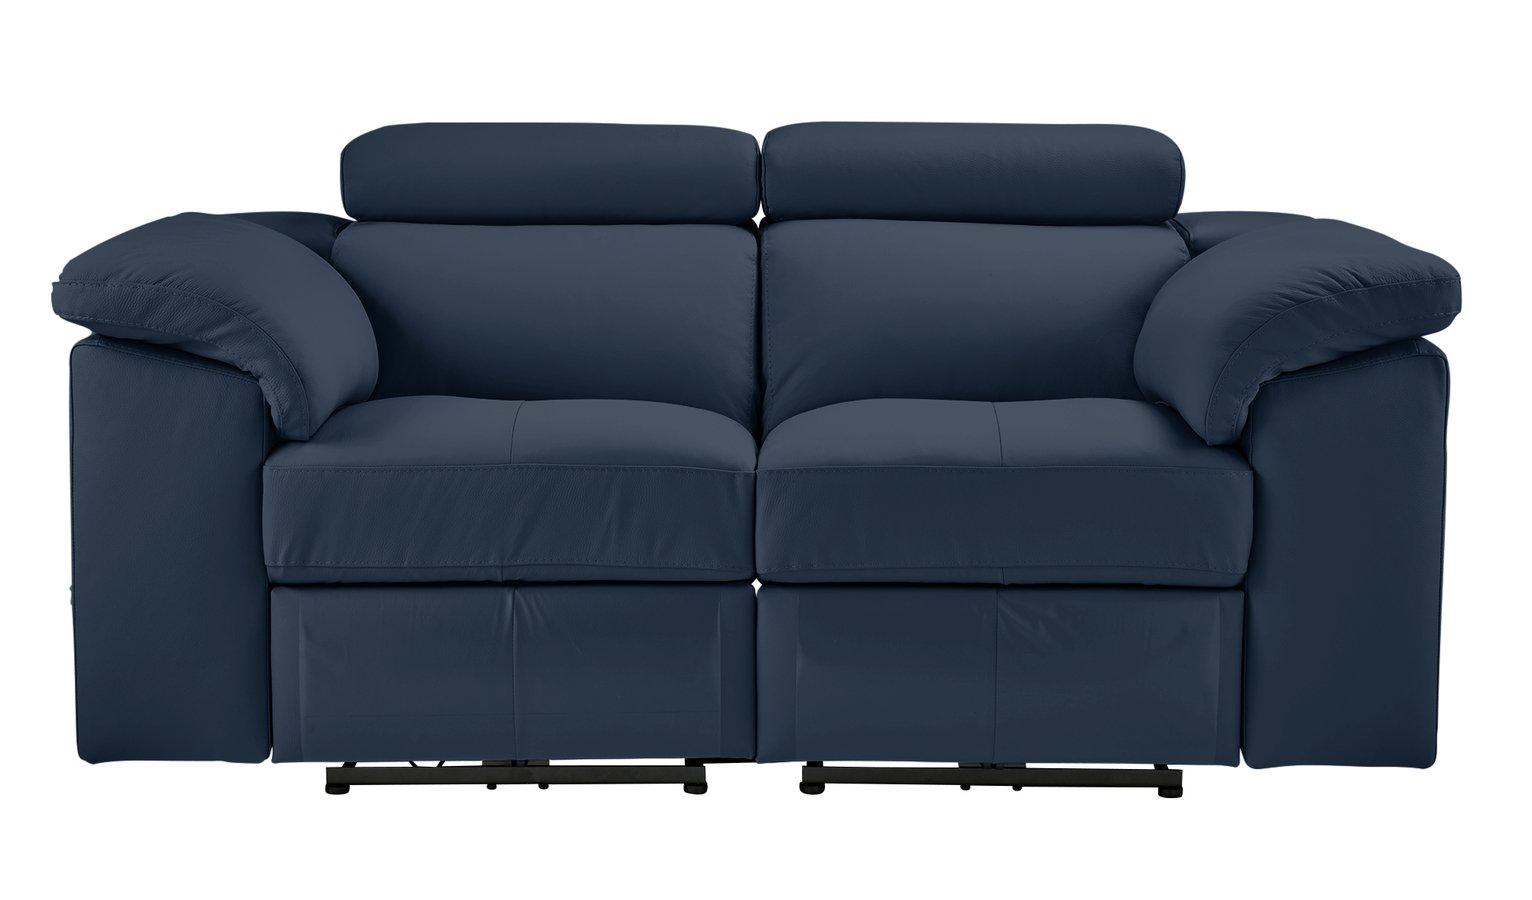 Argos Home Valencia 2 Seater Leather Recliner Sofa - Blue